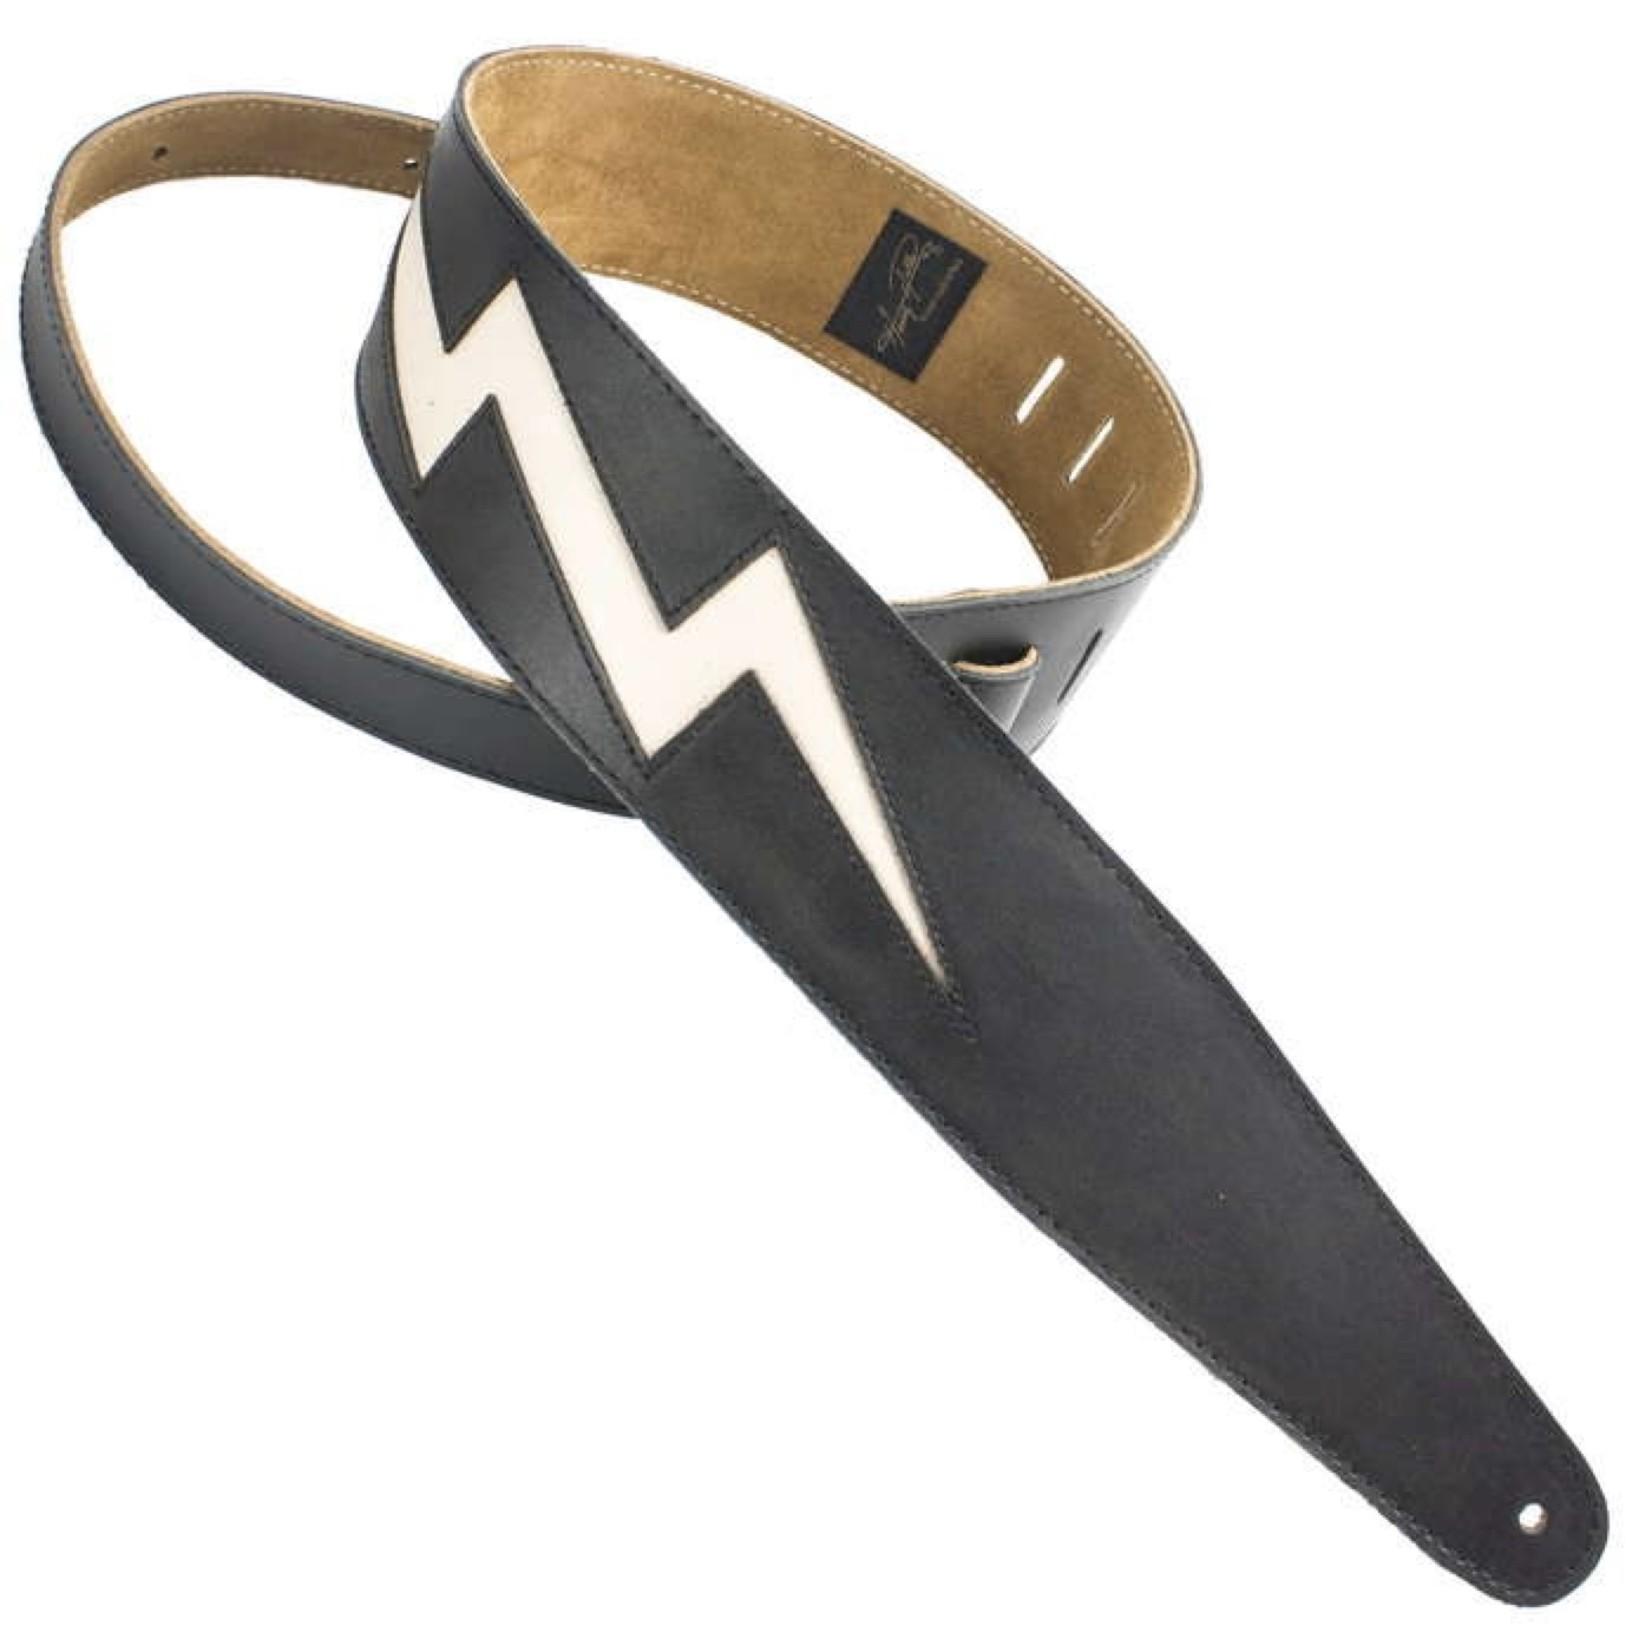 "Henry Heller Henry Heller Peru Black Leather 2.5"" Guitar/Bass Strap with Modern Rocker Bone White Bolt (HPLB-BLK)"